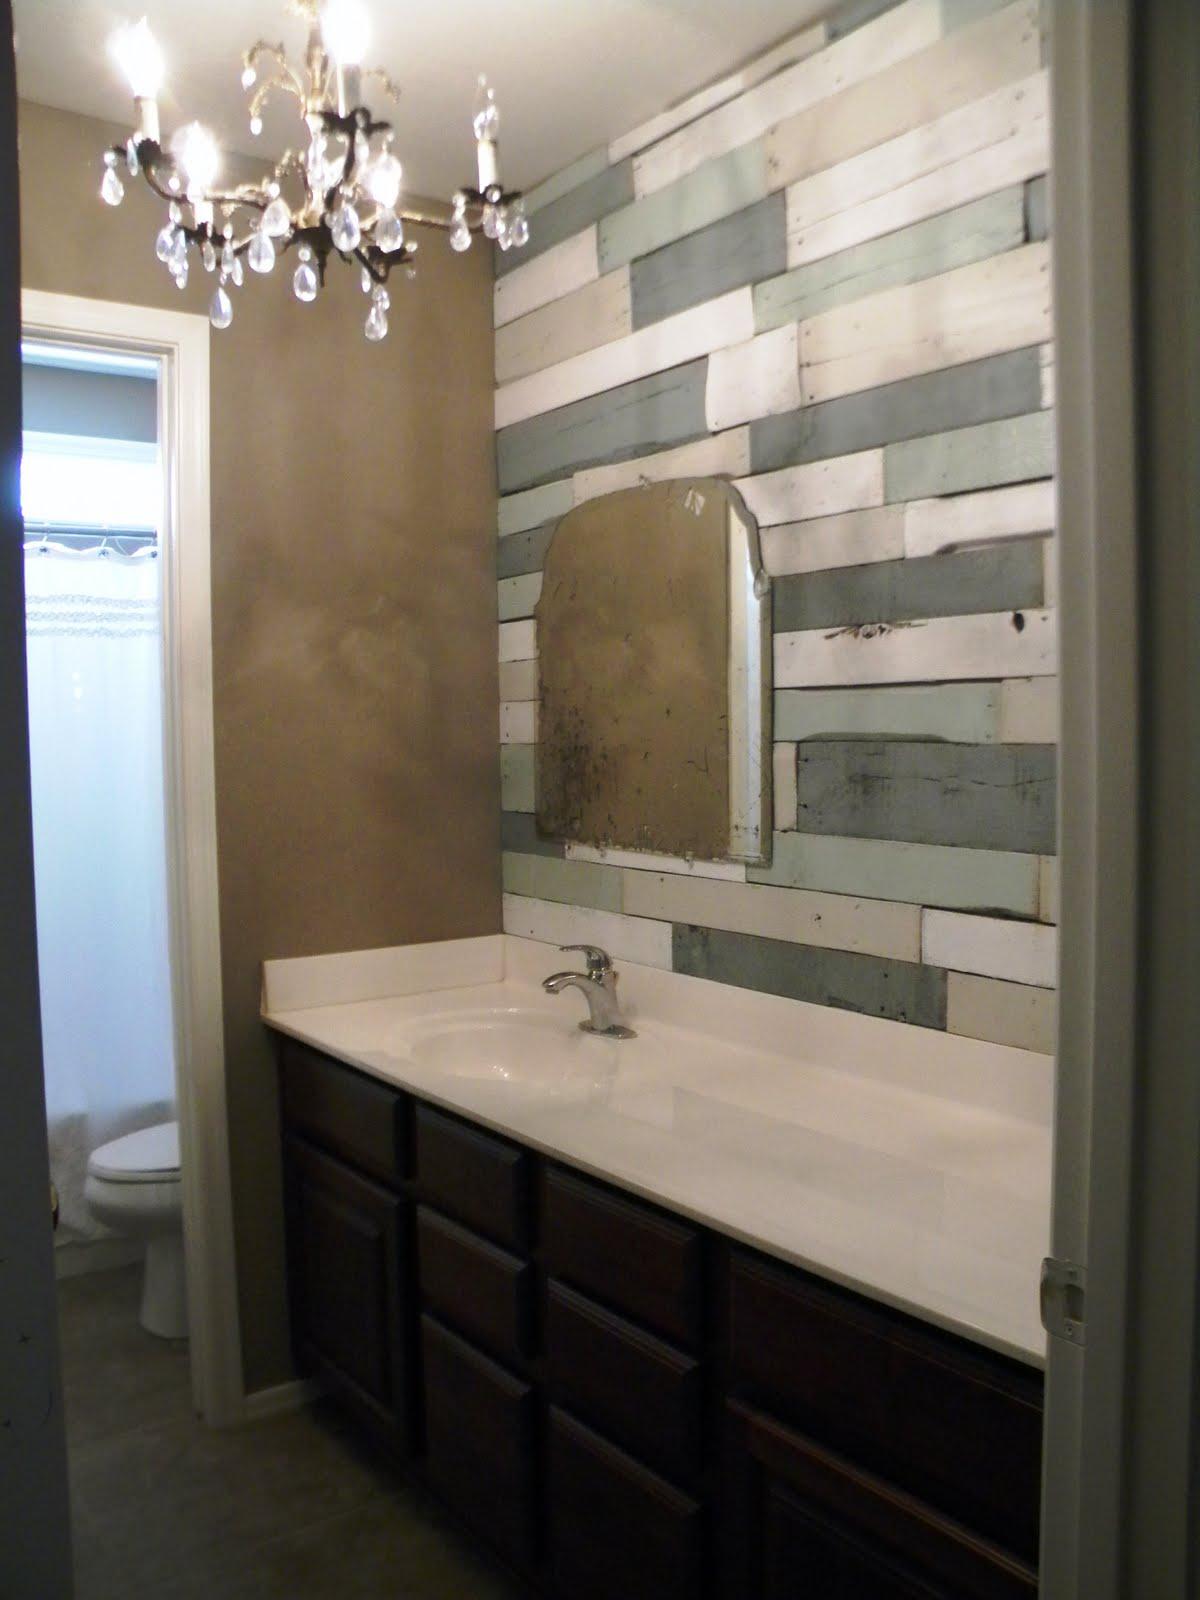 Barnwood Bathroom Eliza Loren Designs From Do It Yourself To Did It Myself